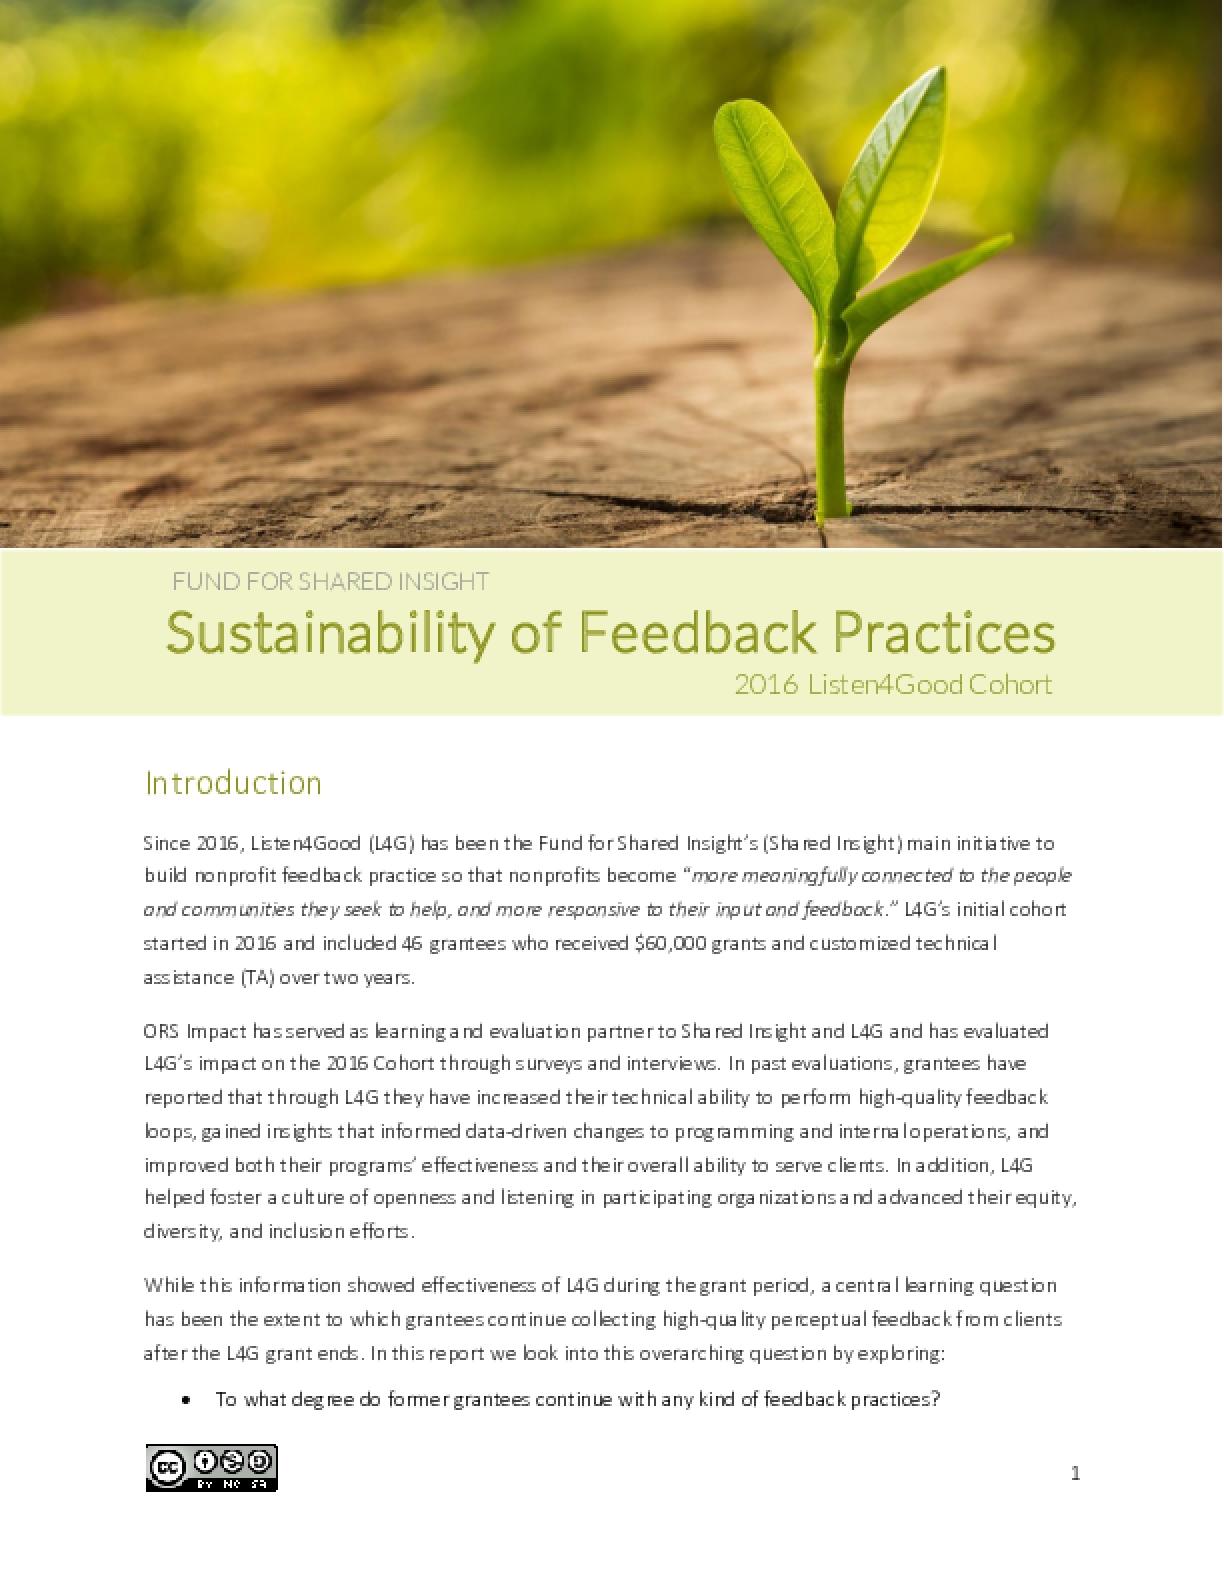 Sustainability of Feedback Practice: 2016 Listen4Good Cohort